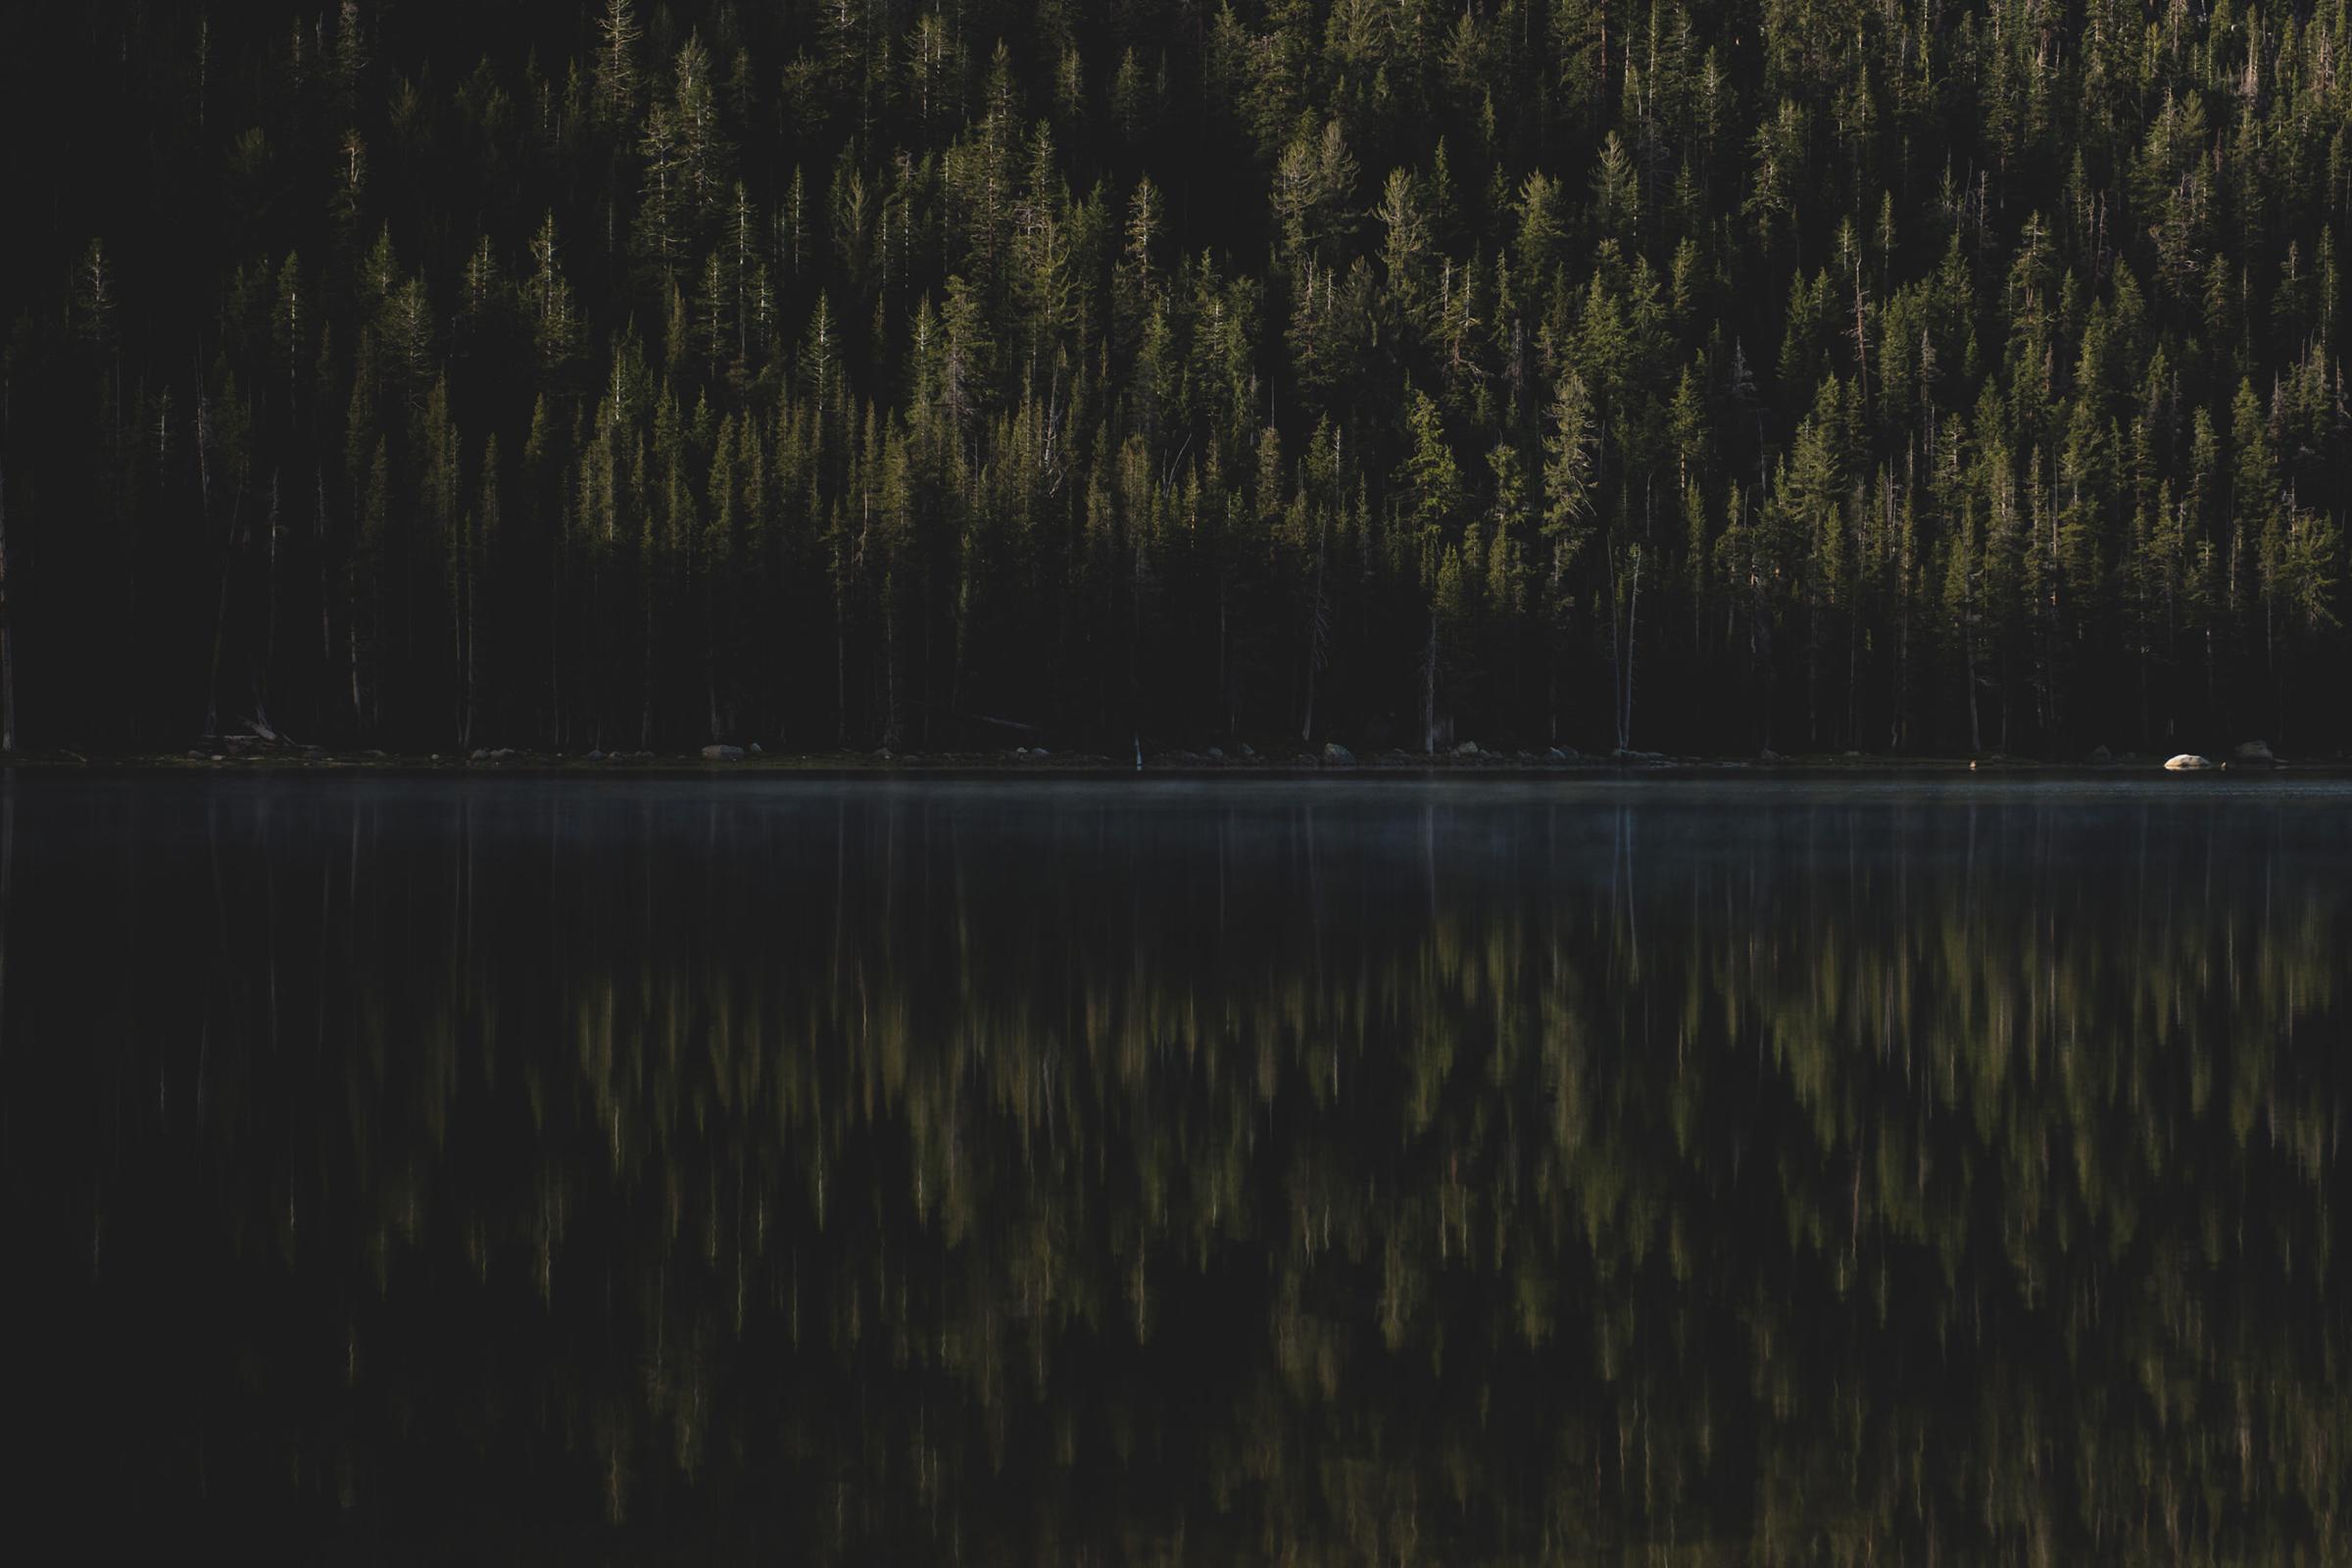 full_clif-yosemite-reflection.jpg